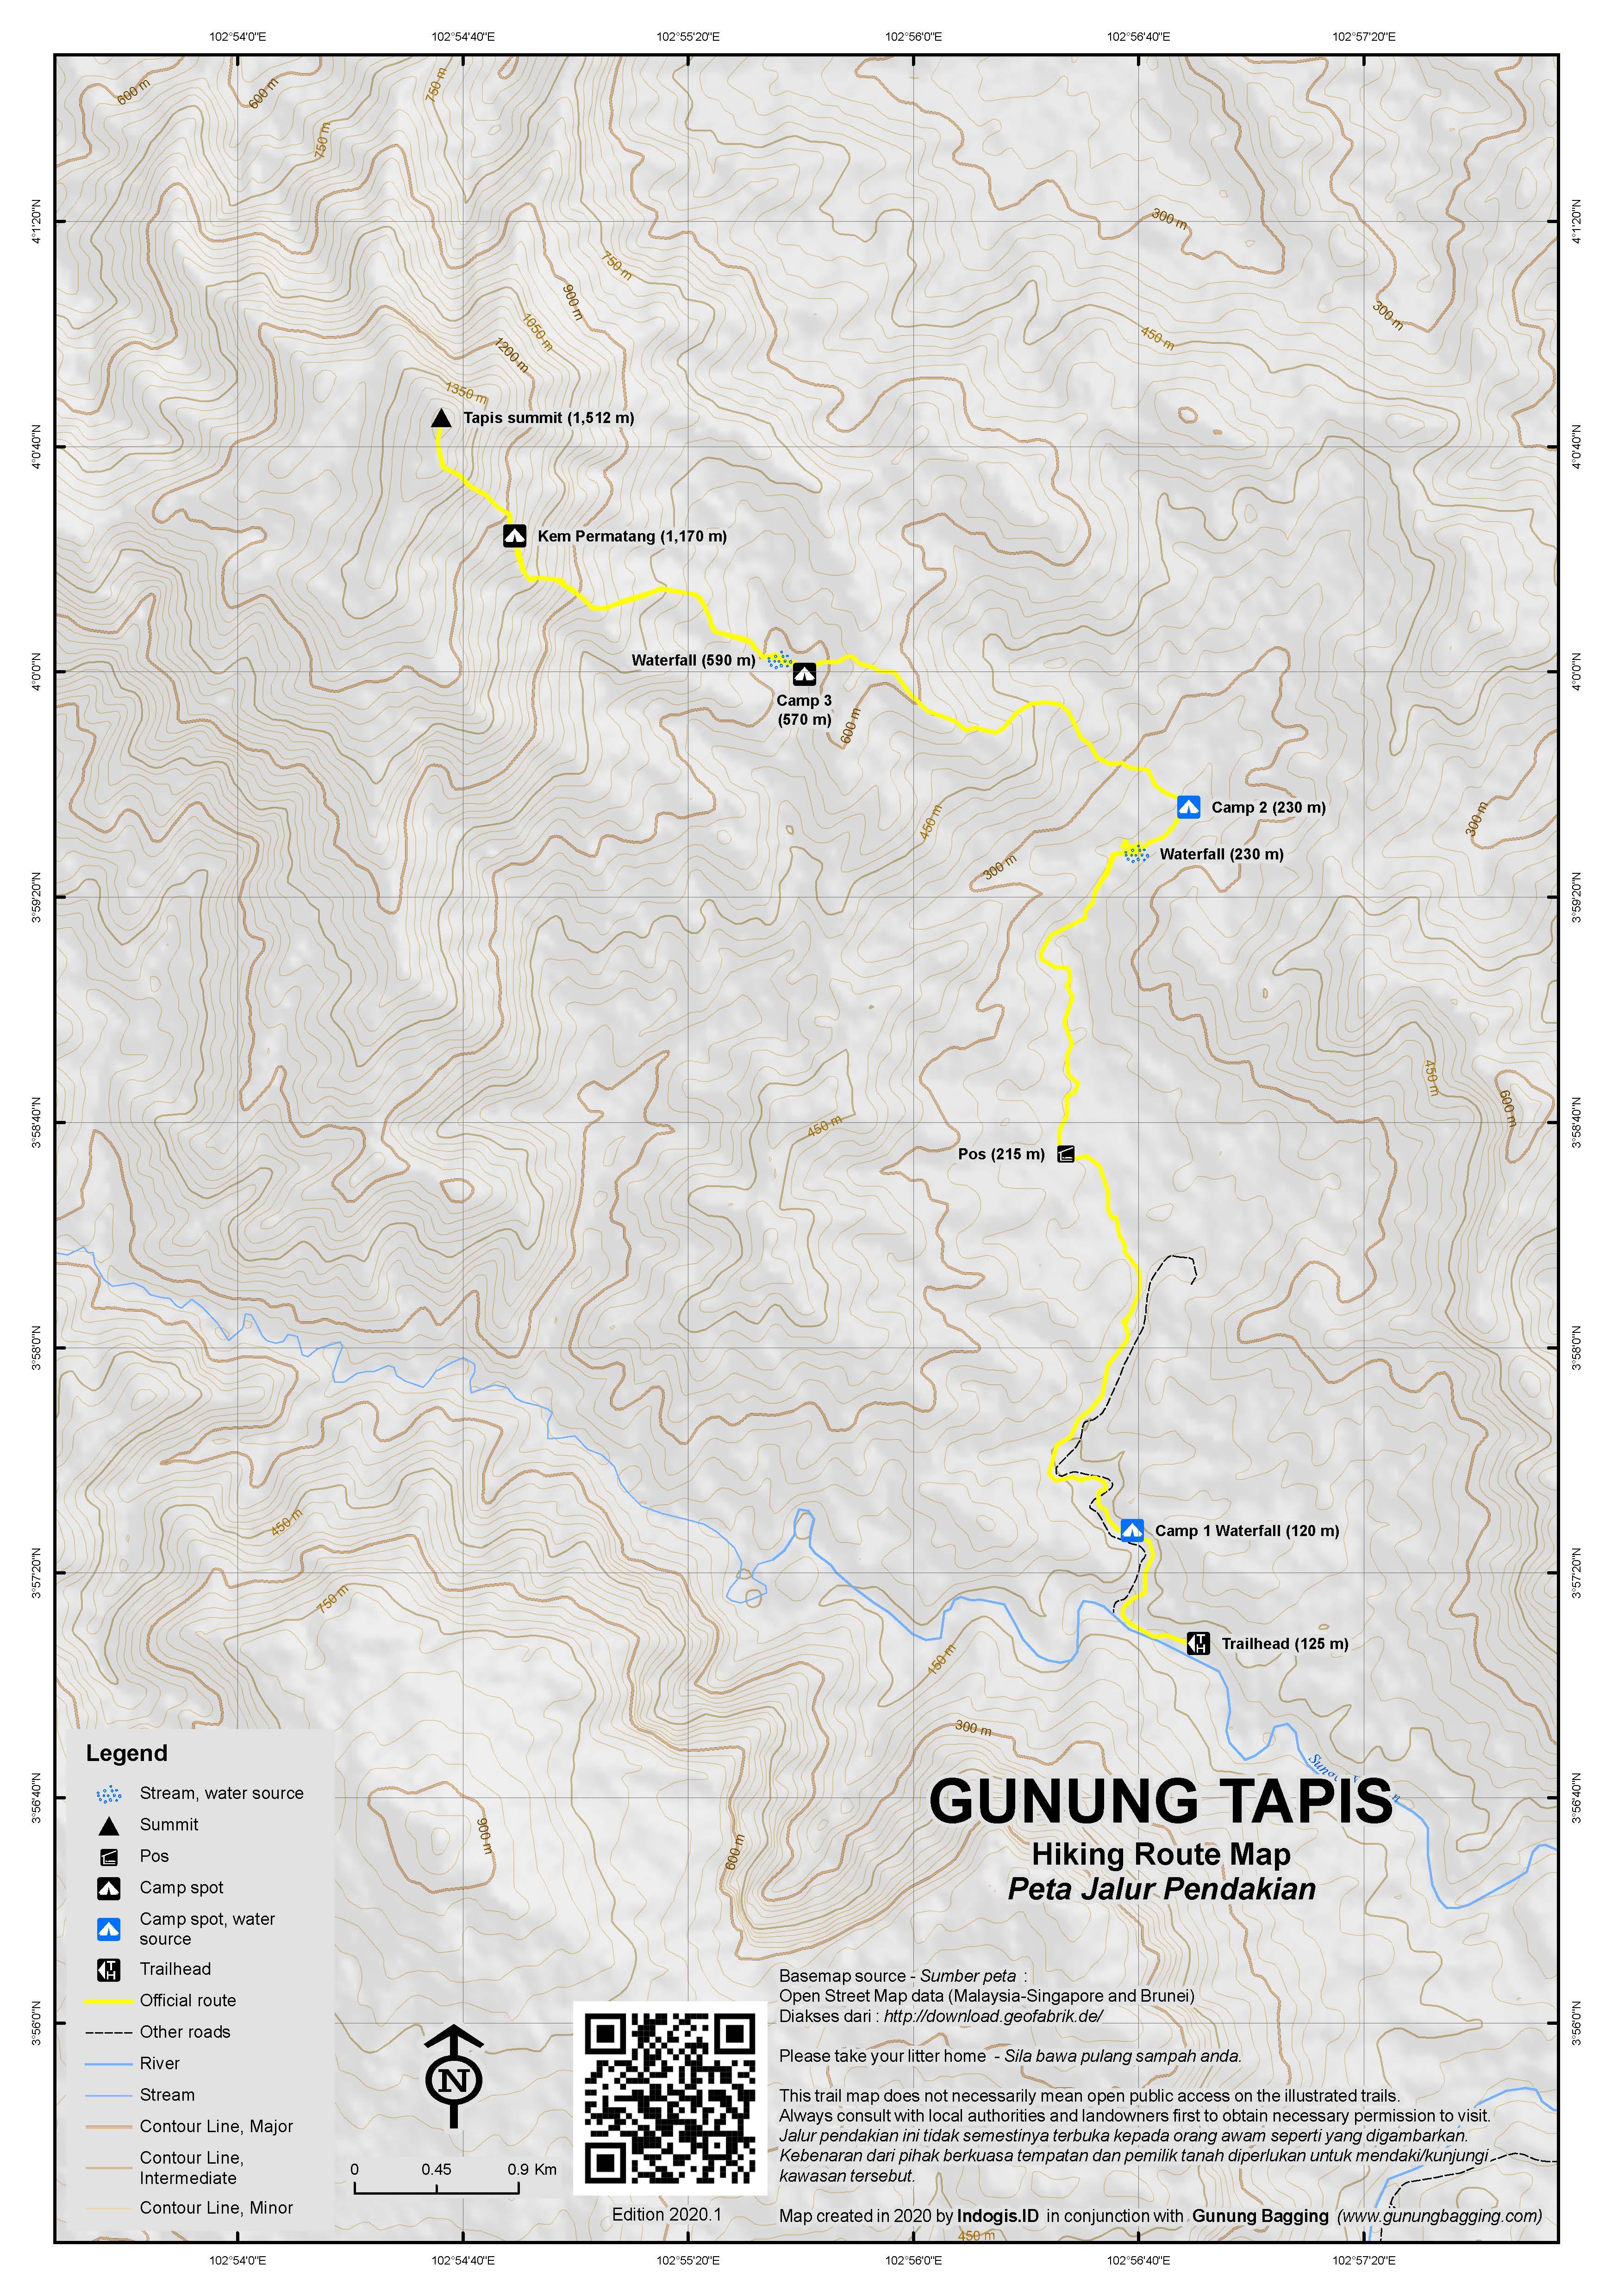 Peta Jalur Pendakian Gunung Tapis